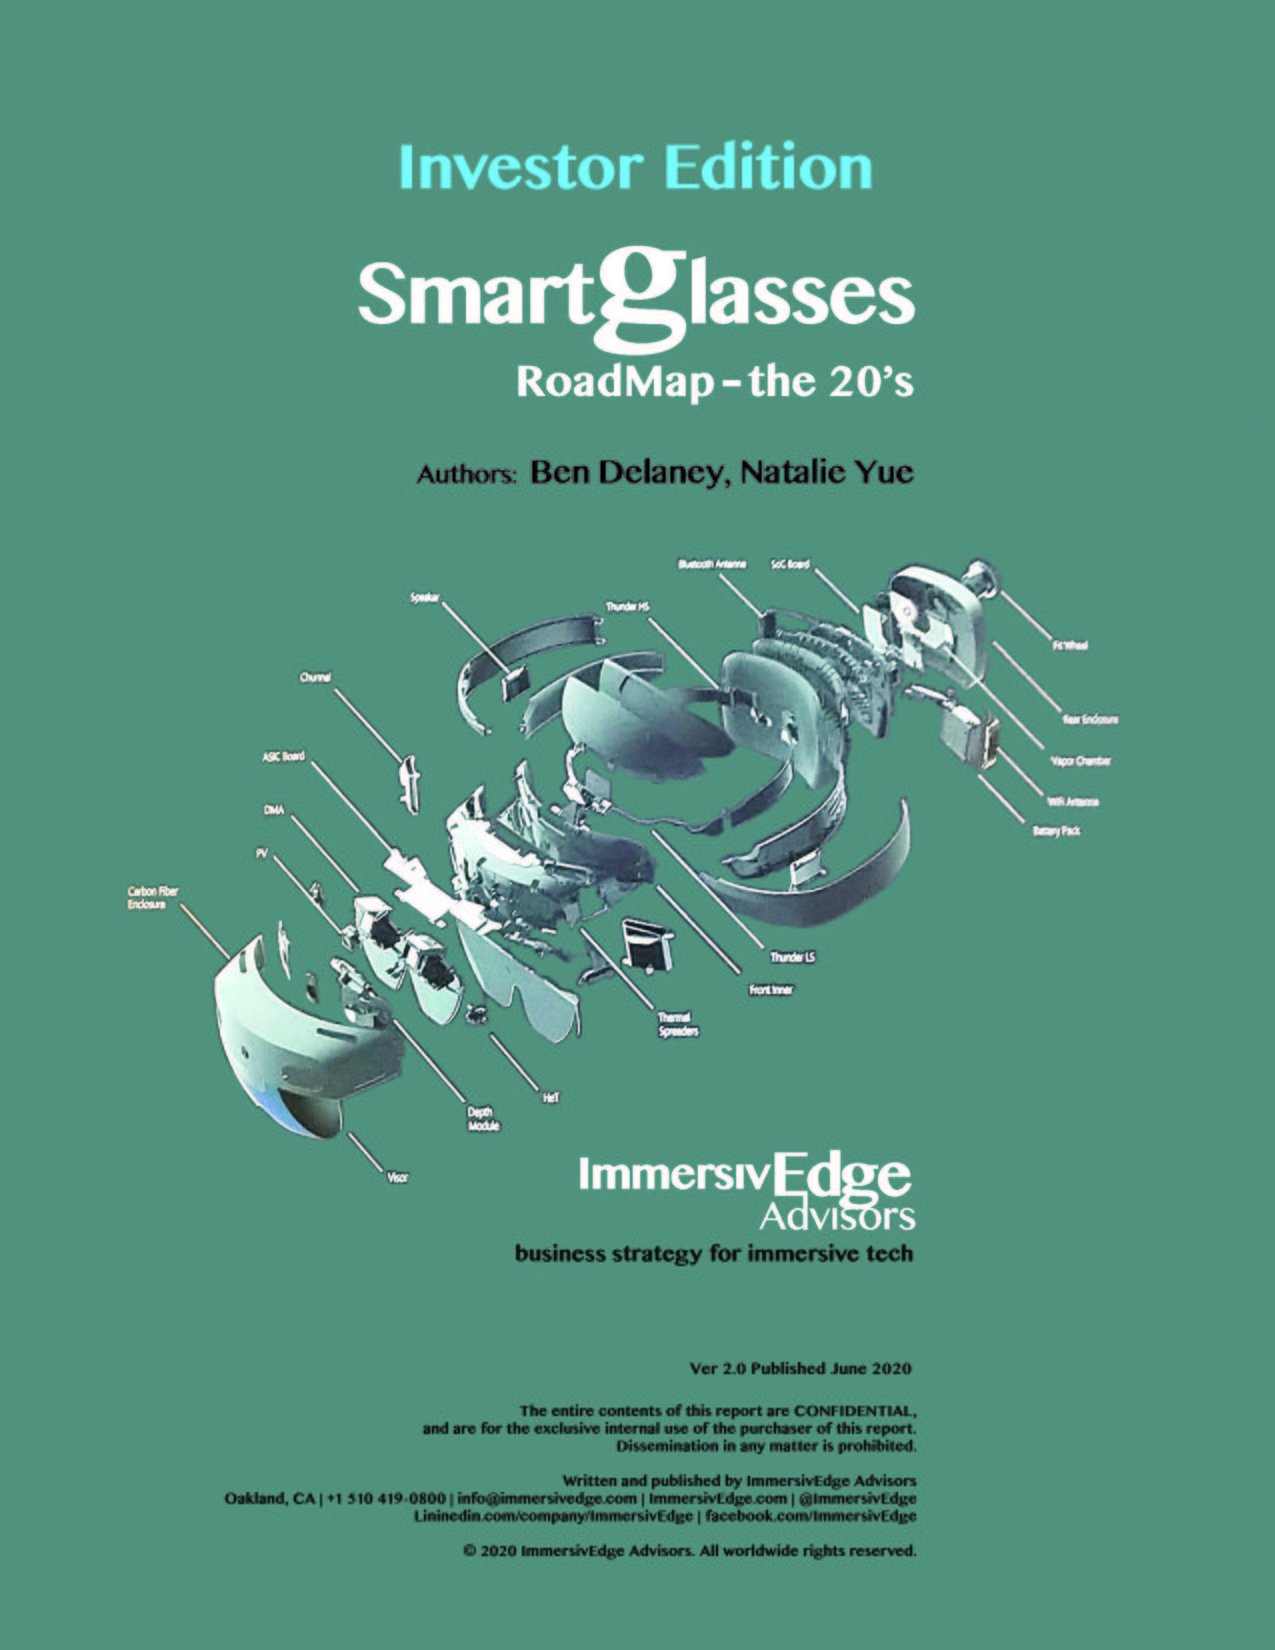 Smartglasses Roadmap – the 20's, Investors Edition